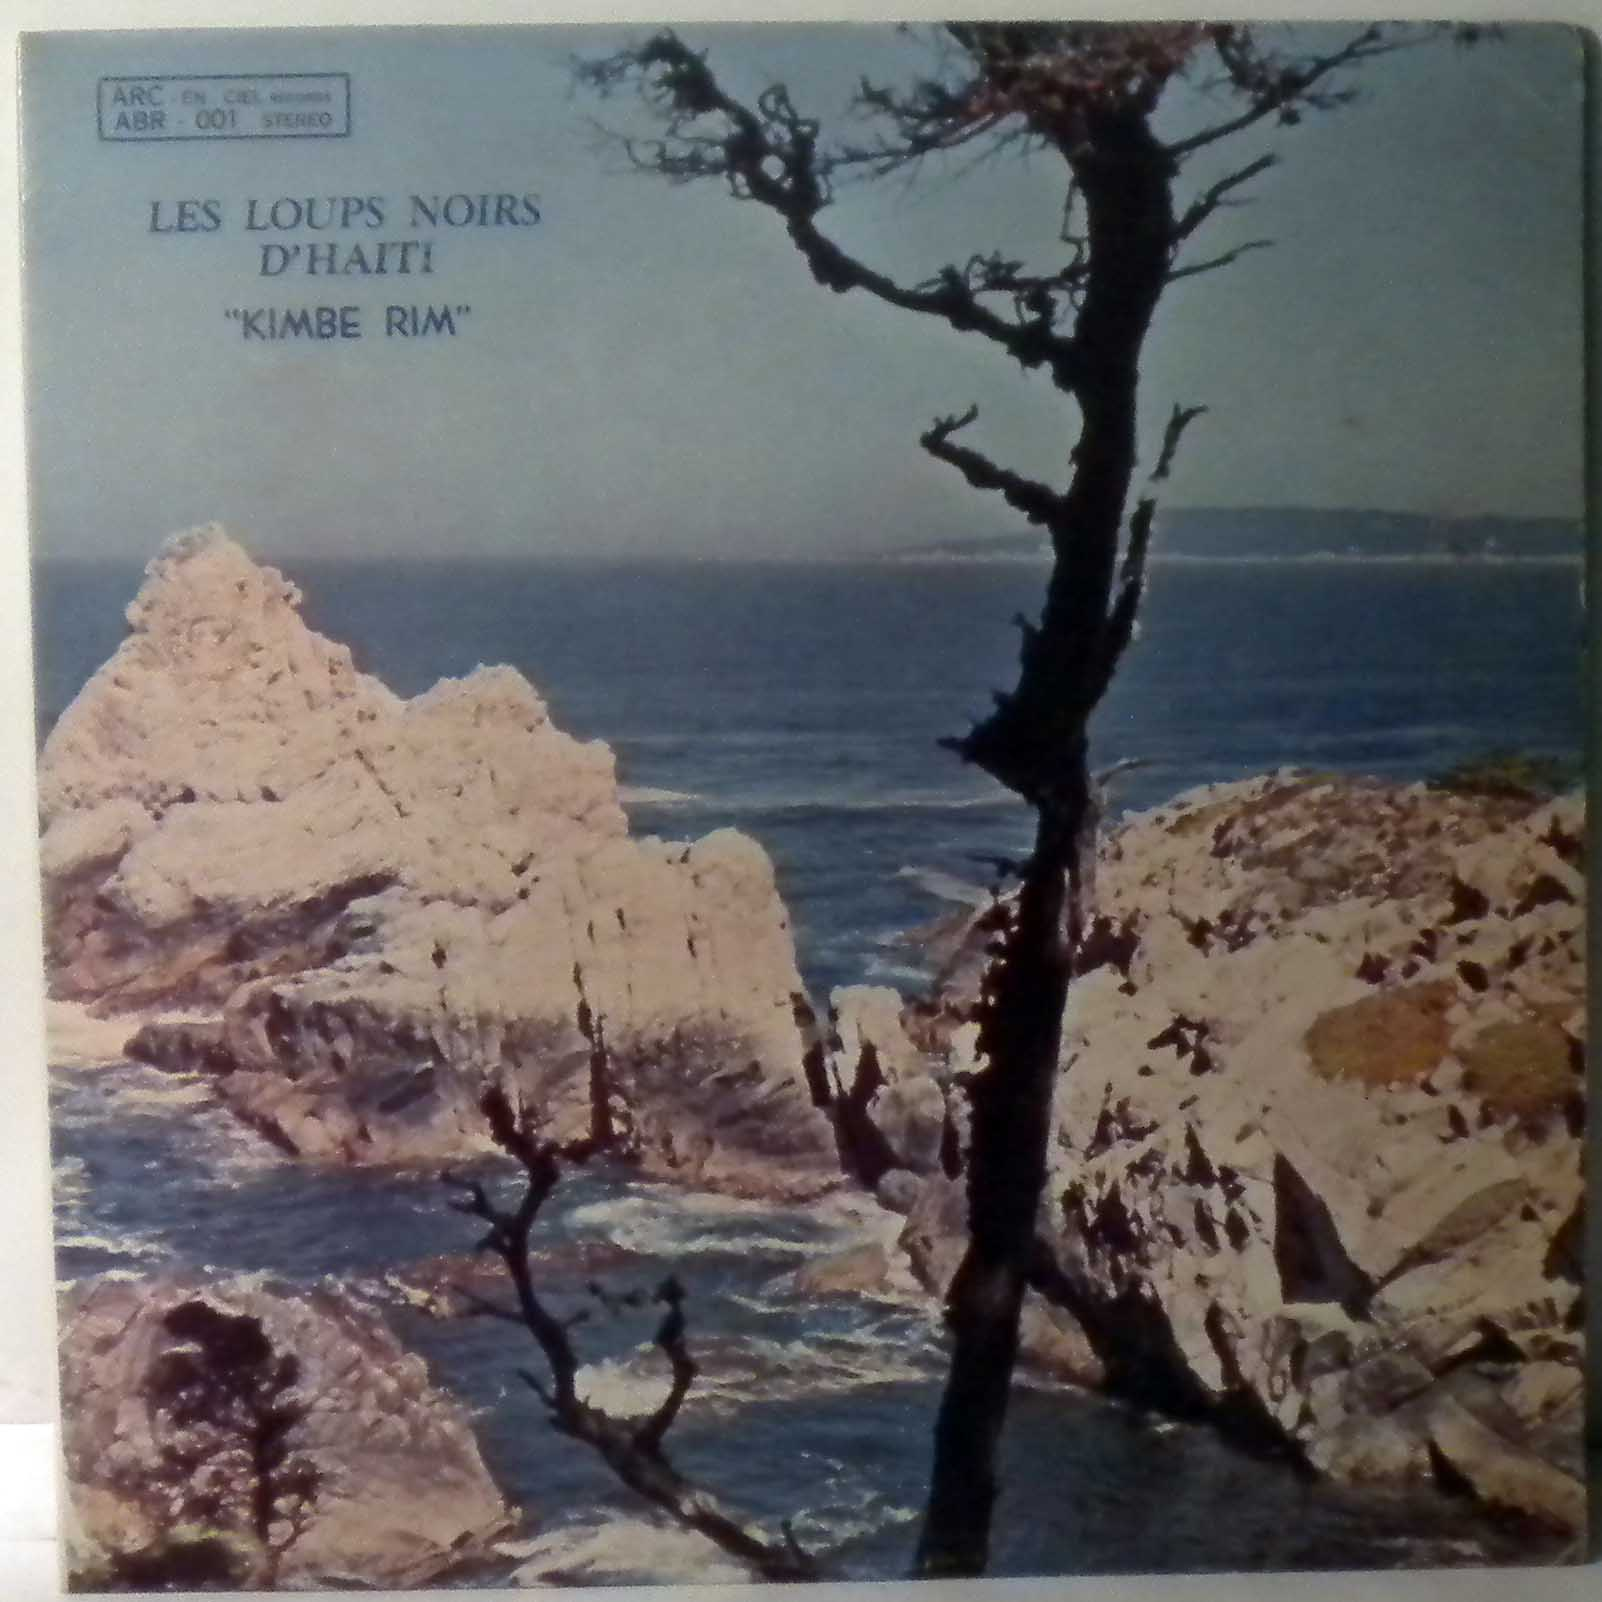 LES LOUPS NOIRS D'HAITI - Kimbe Rim - LP